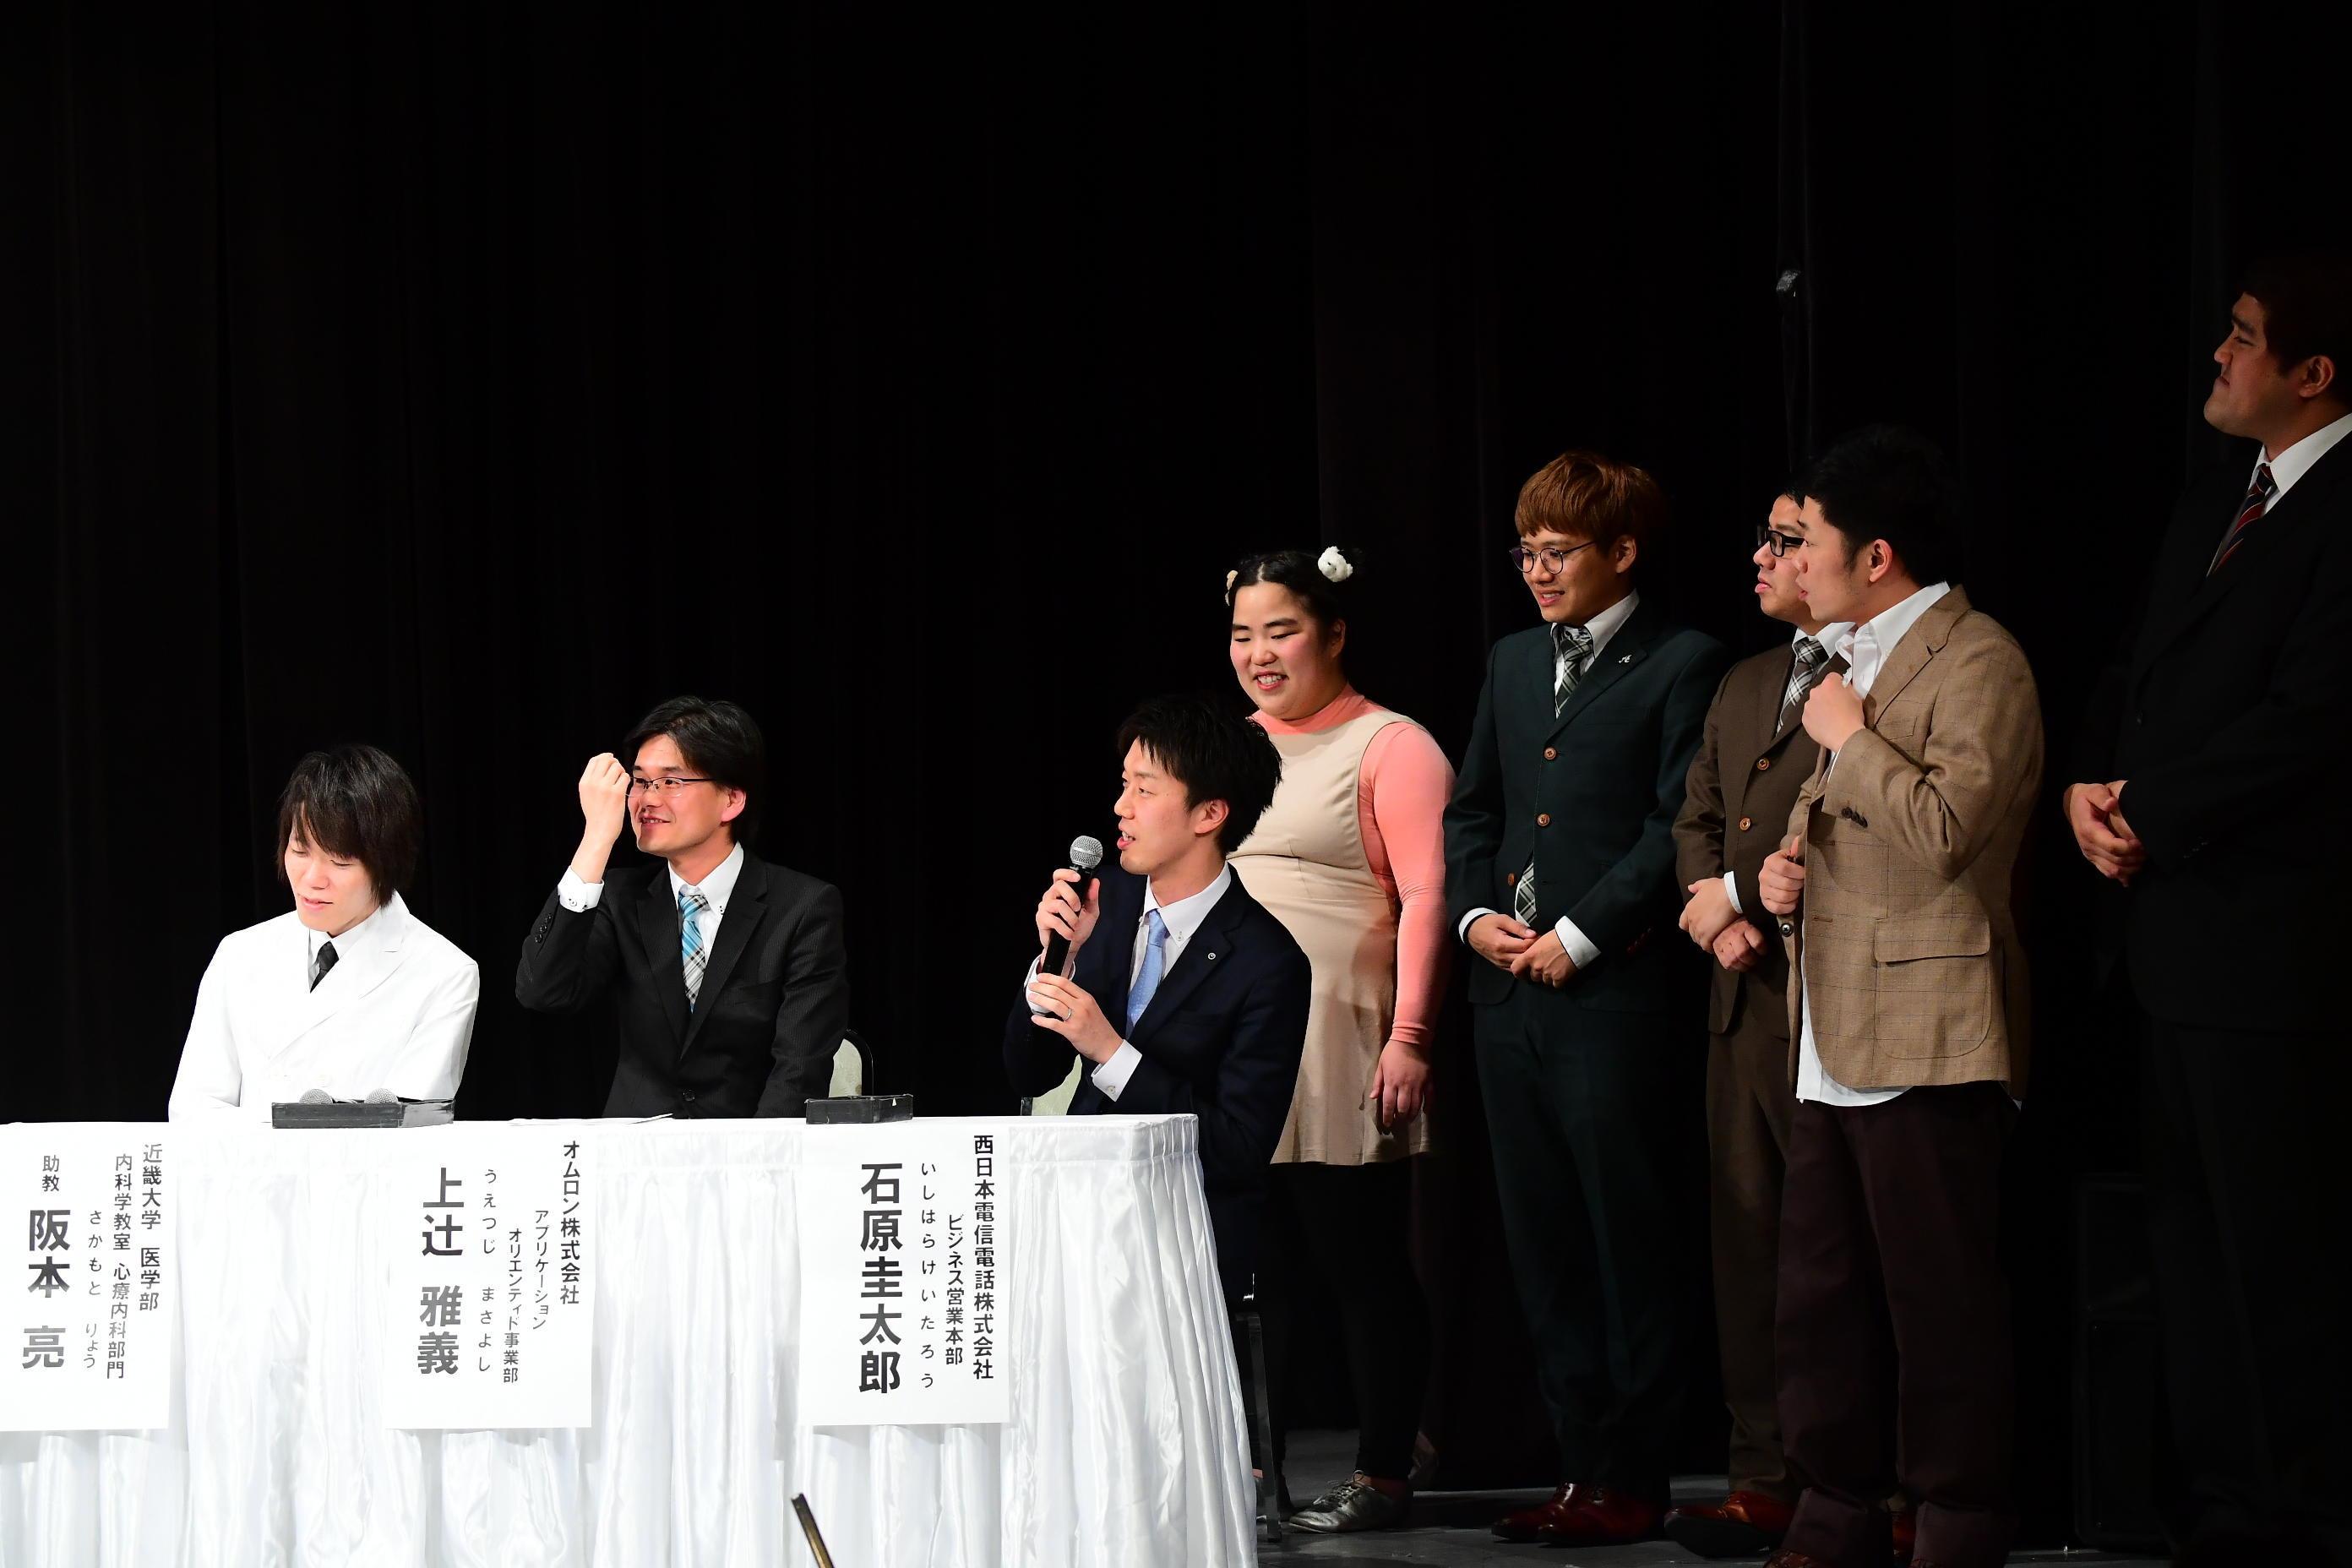 http://news.yoshimoto.co.jp/20170215202802-a5cb5f004bb426a1c103e16f0c4248b67f79cc1d.jpg